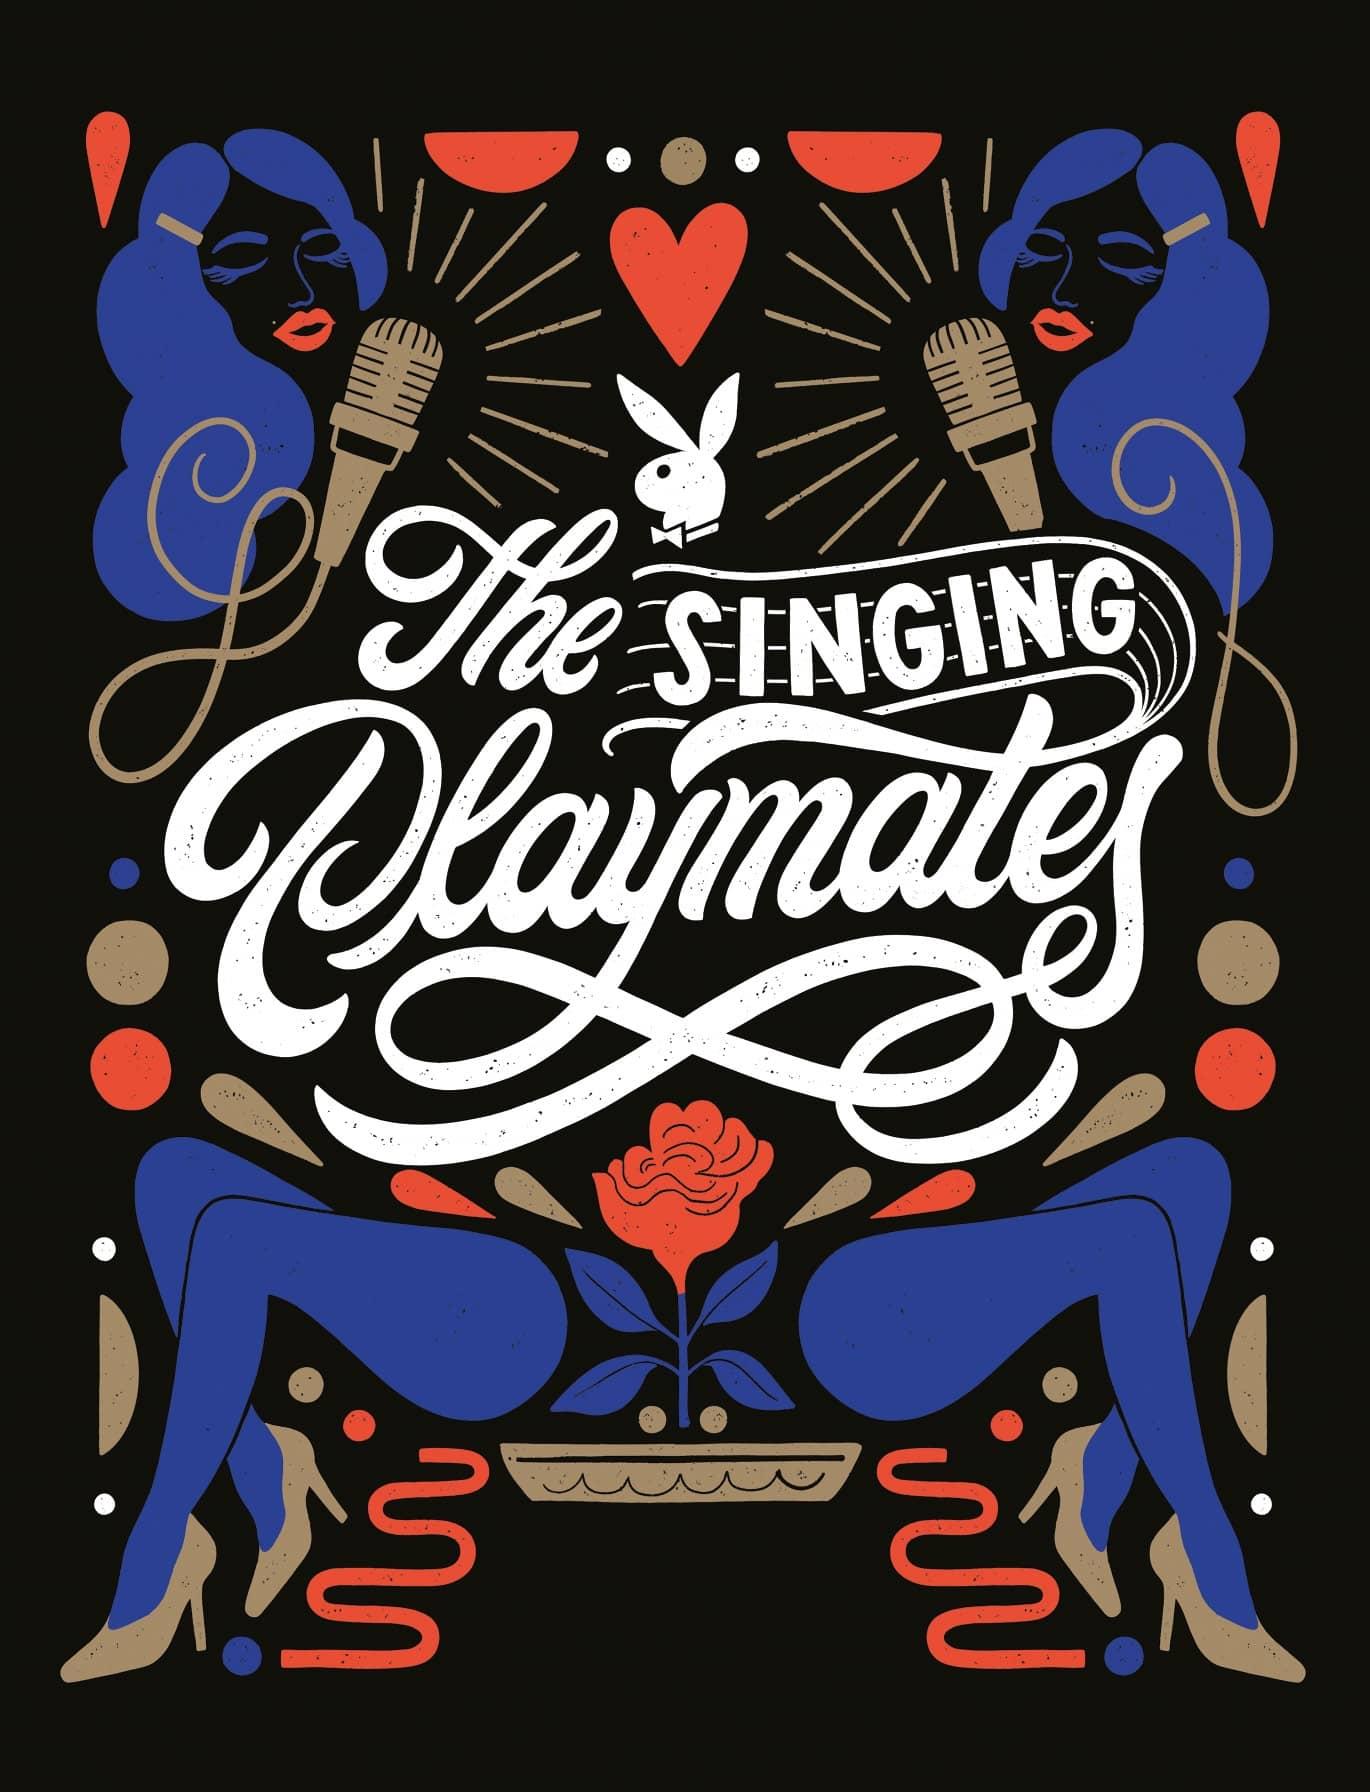 The Singing Playmates